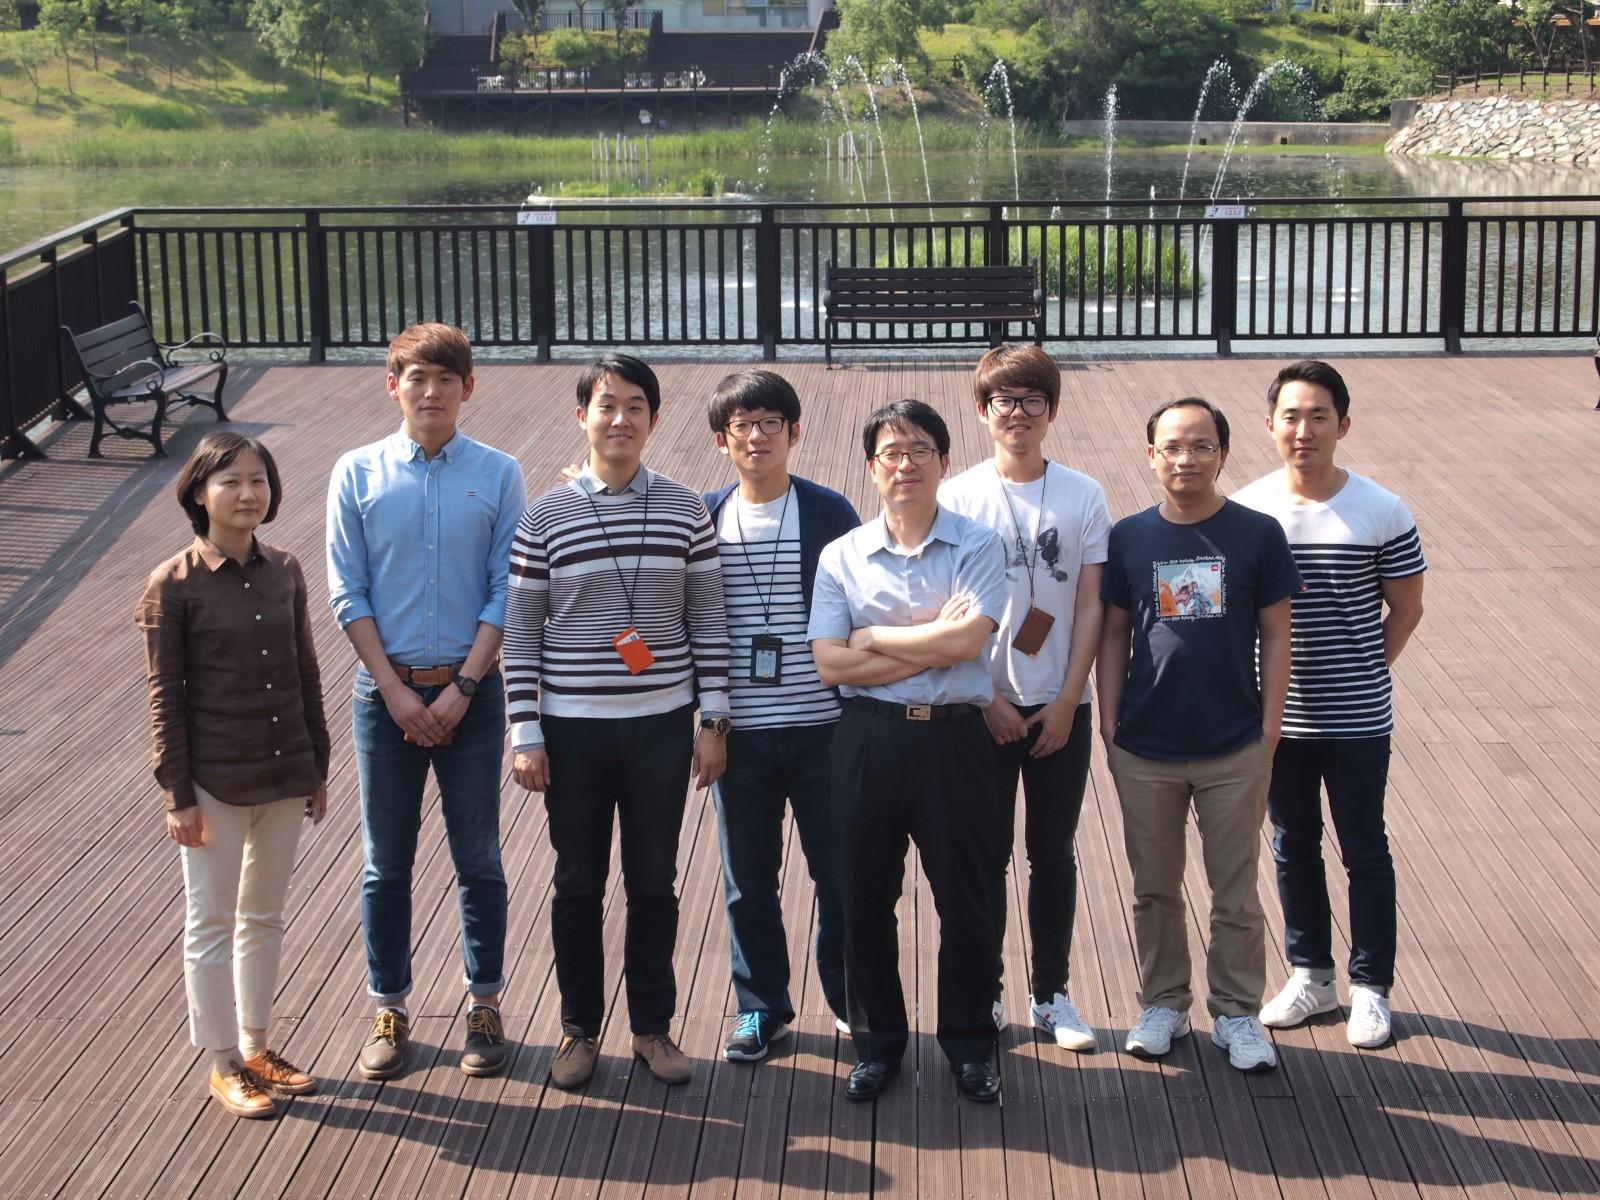 Combustion propulsion lab unist for Kosco fuel